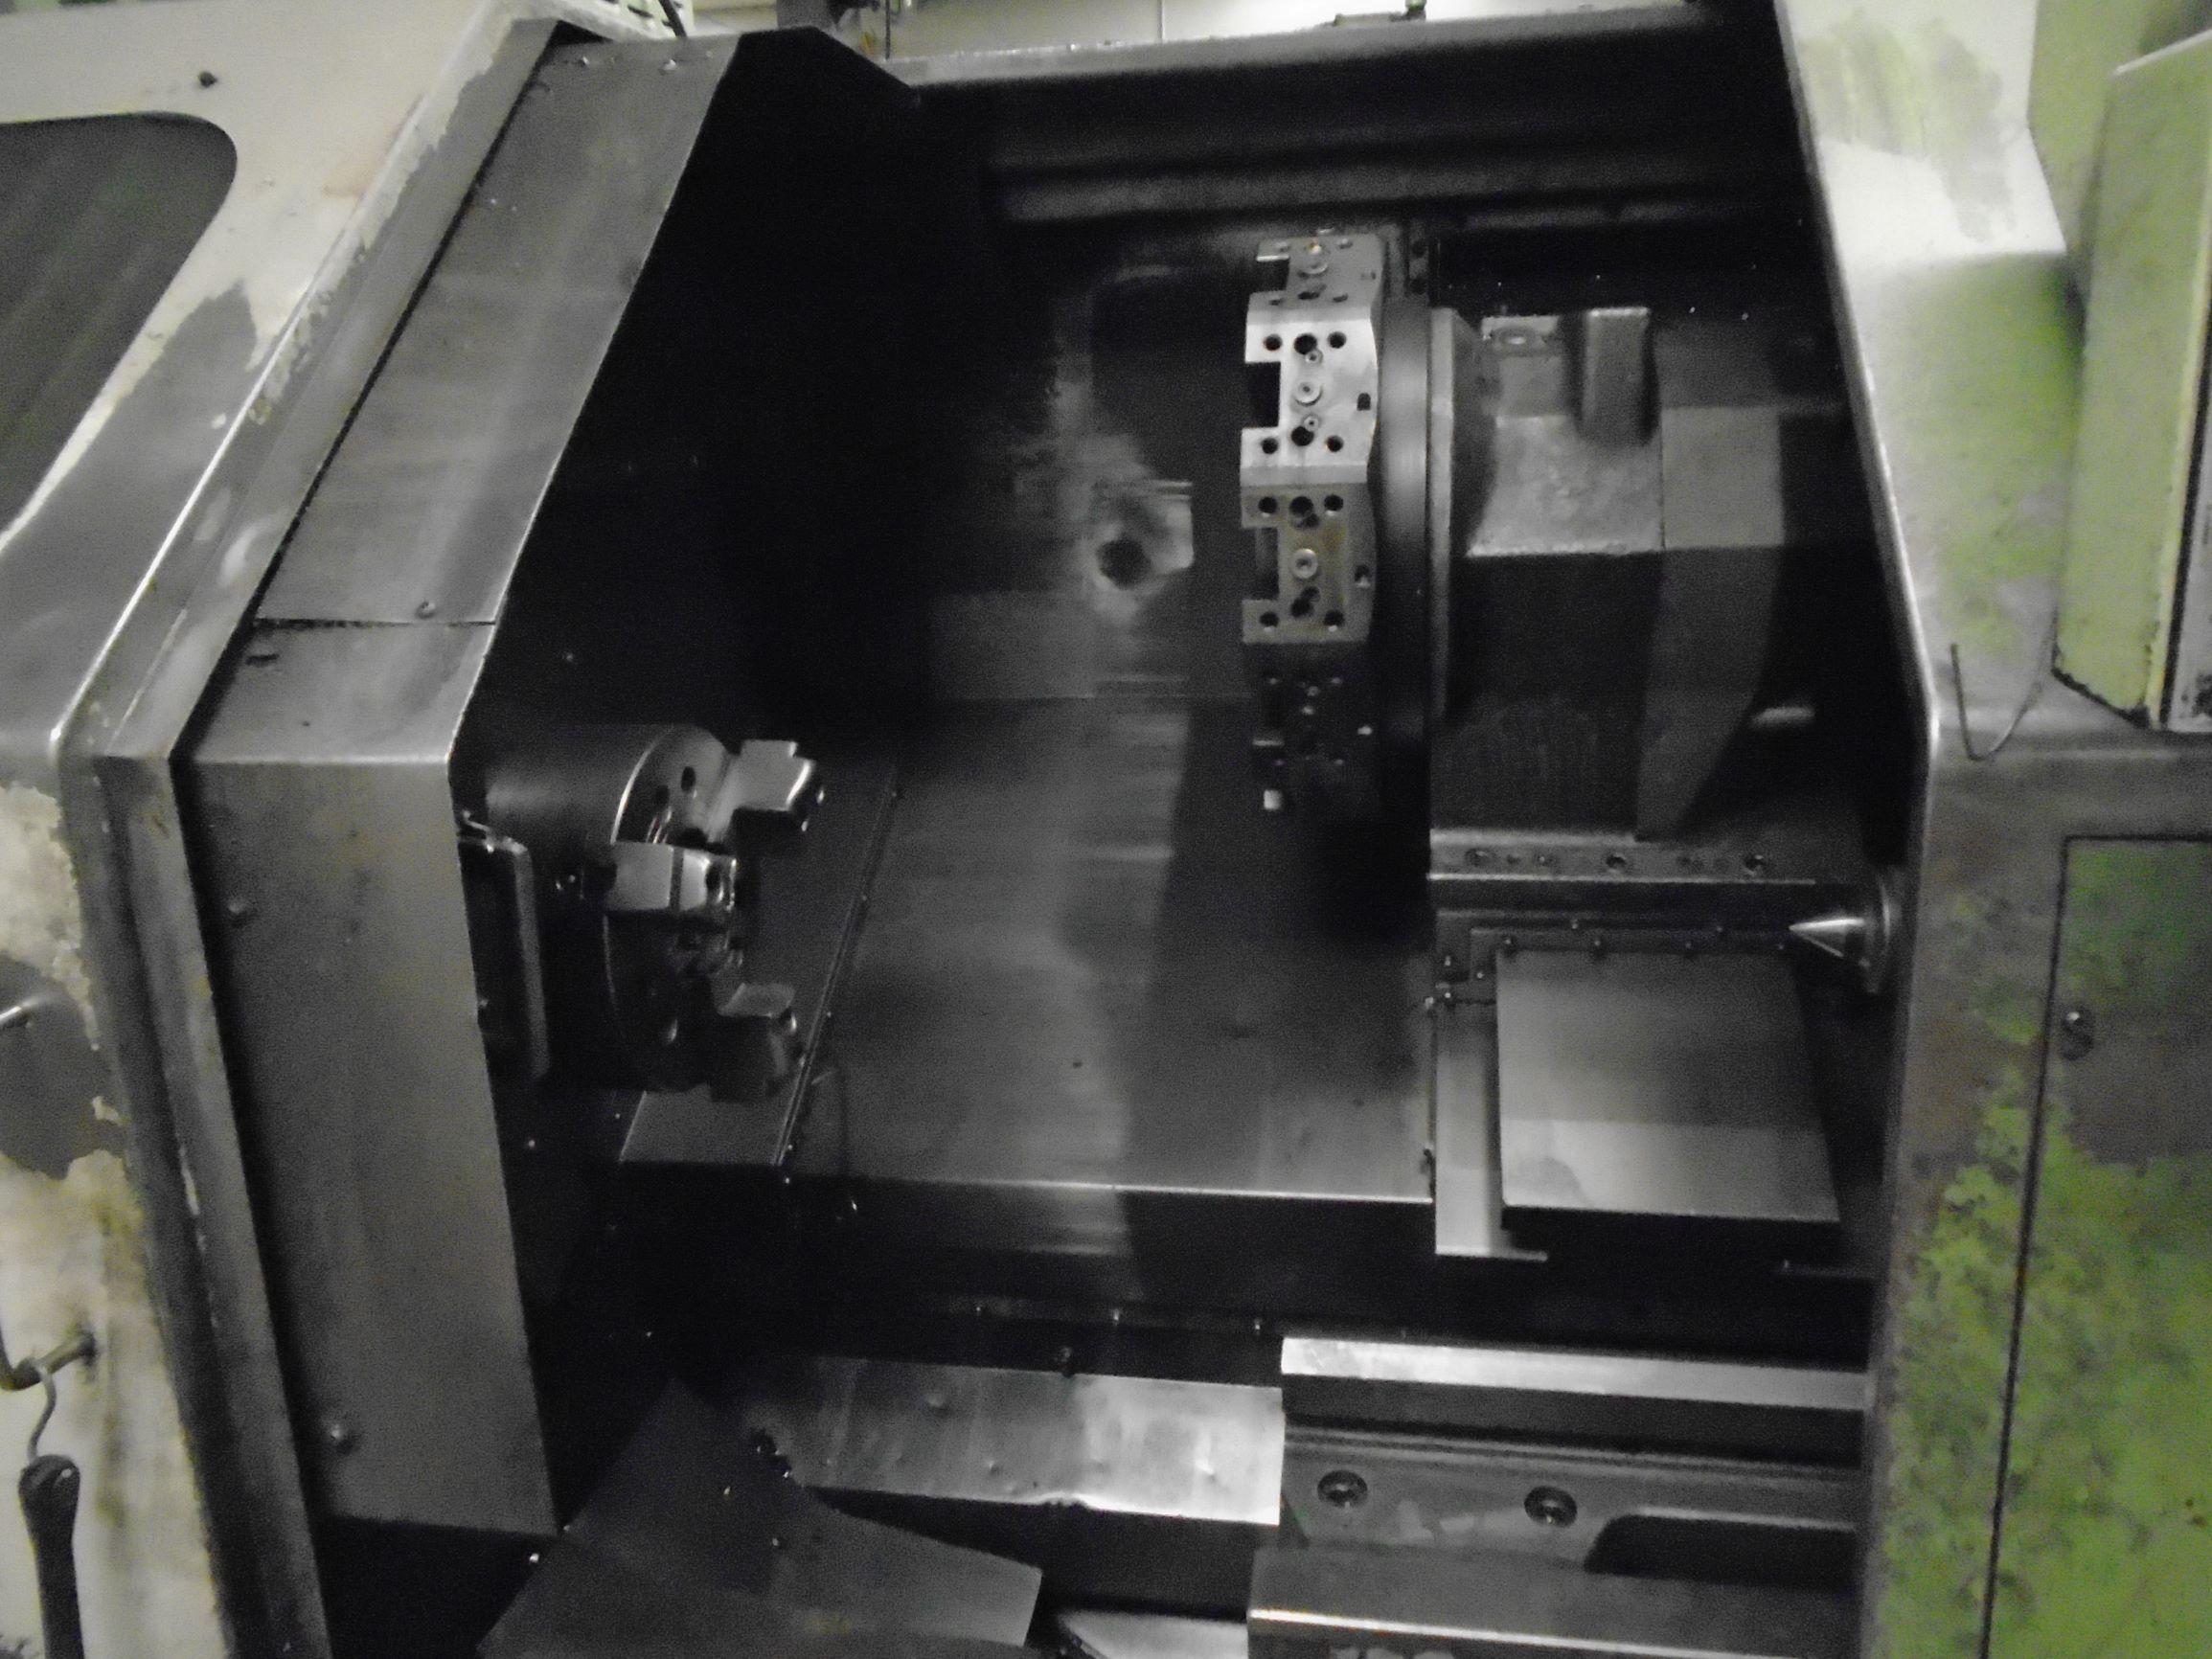 Okuma LB25 Turning Center, S/N 0089, New Approx 1990.